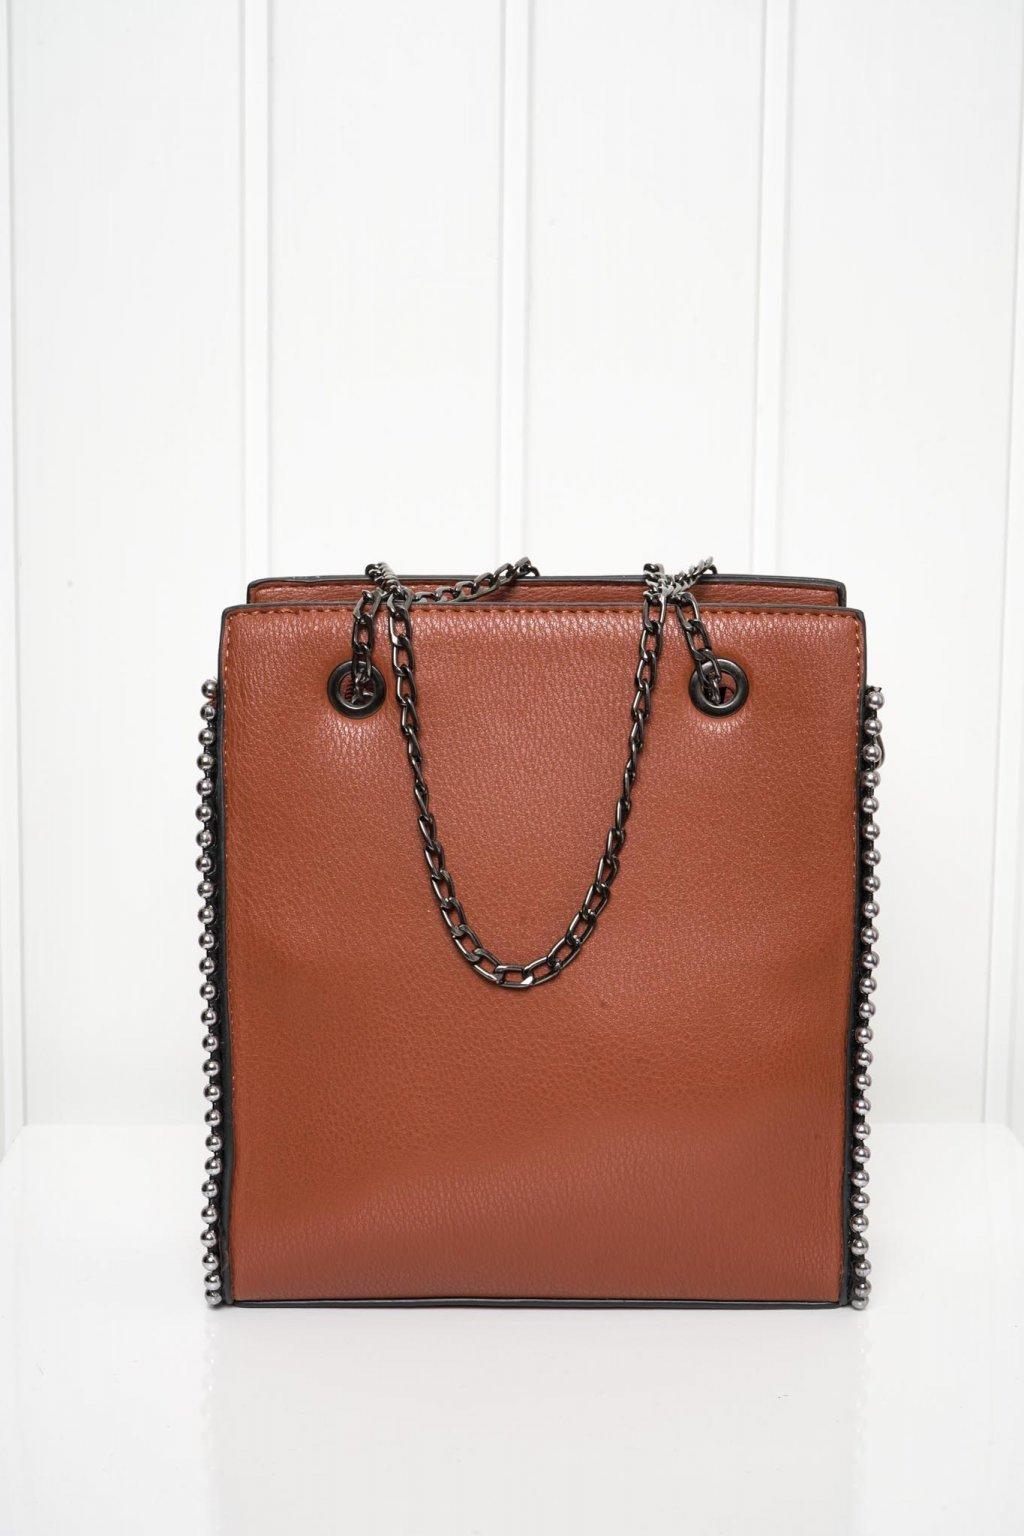 Kabelka, crossbody, ruksak, shopping bag, shopperka, 200